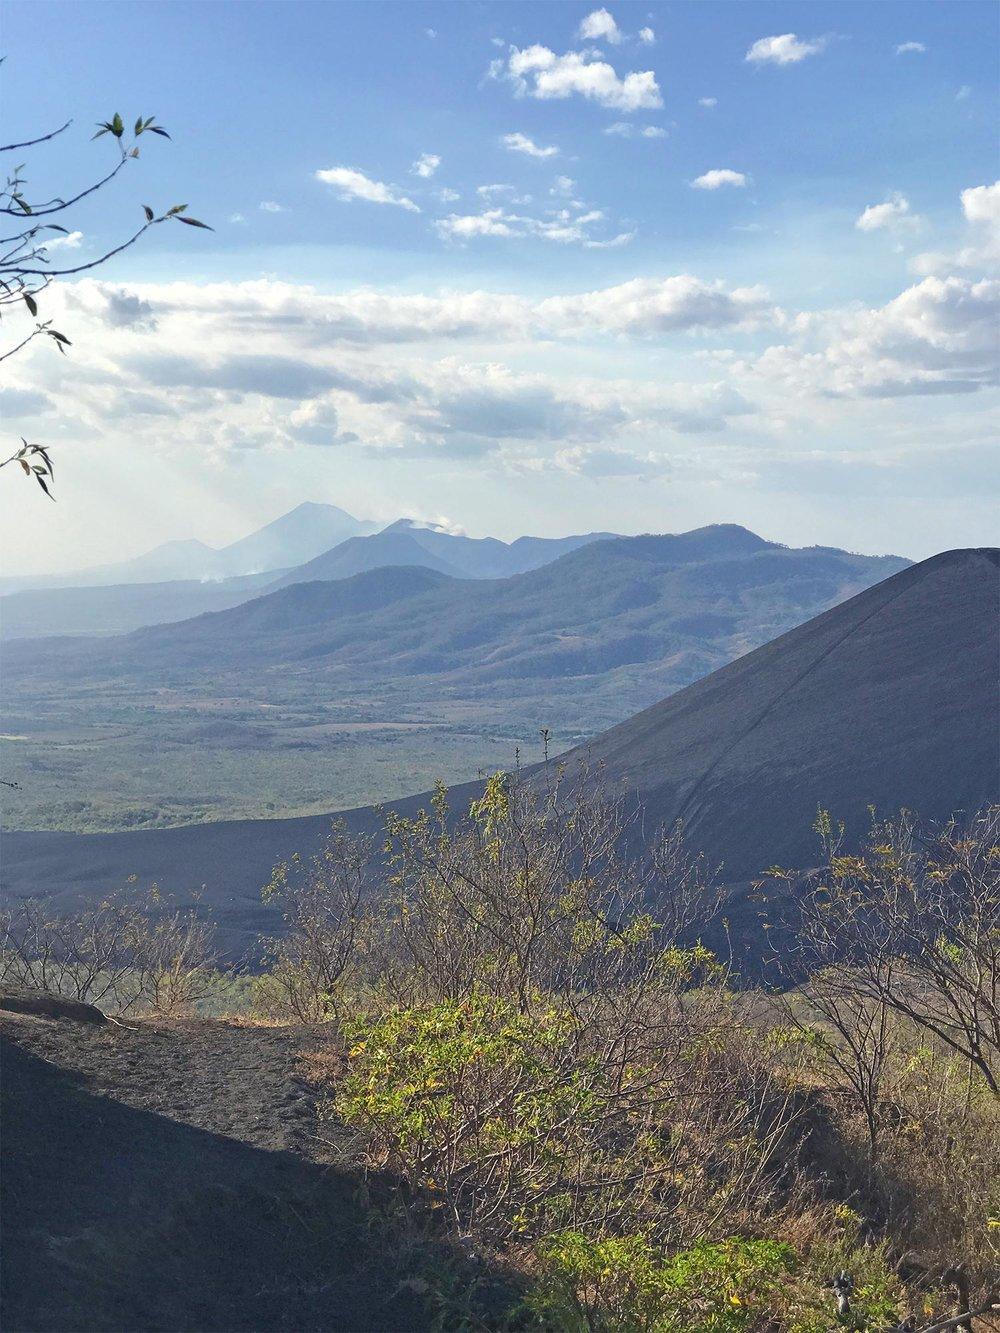 Hiking El Hoyo volcano in Nicaragua